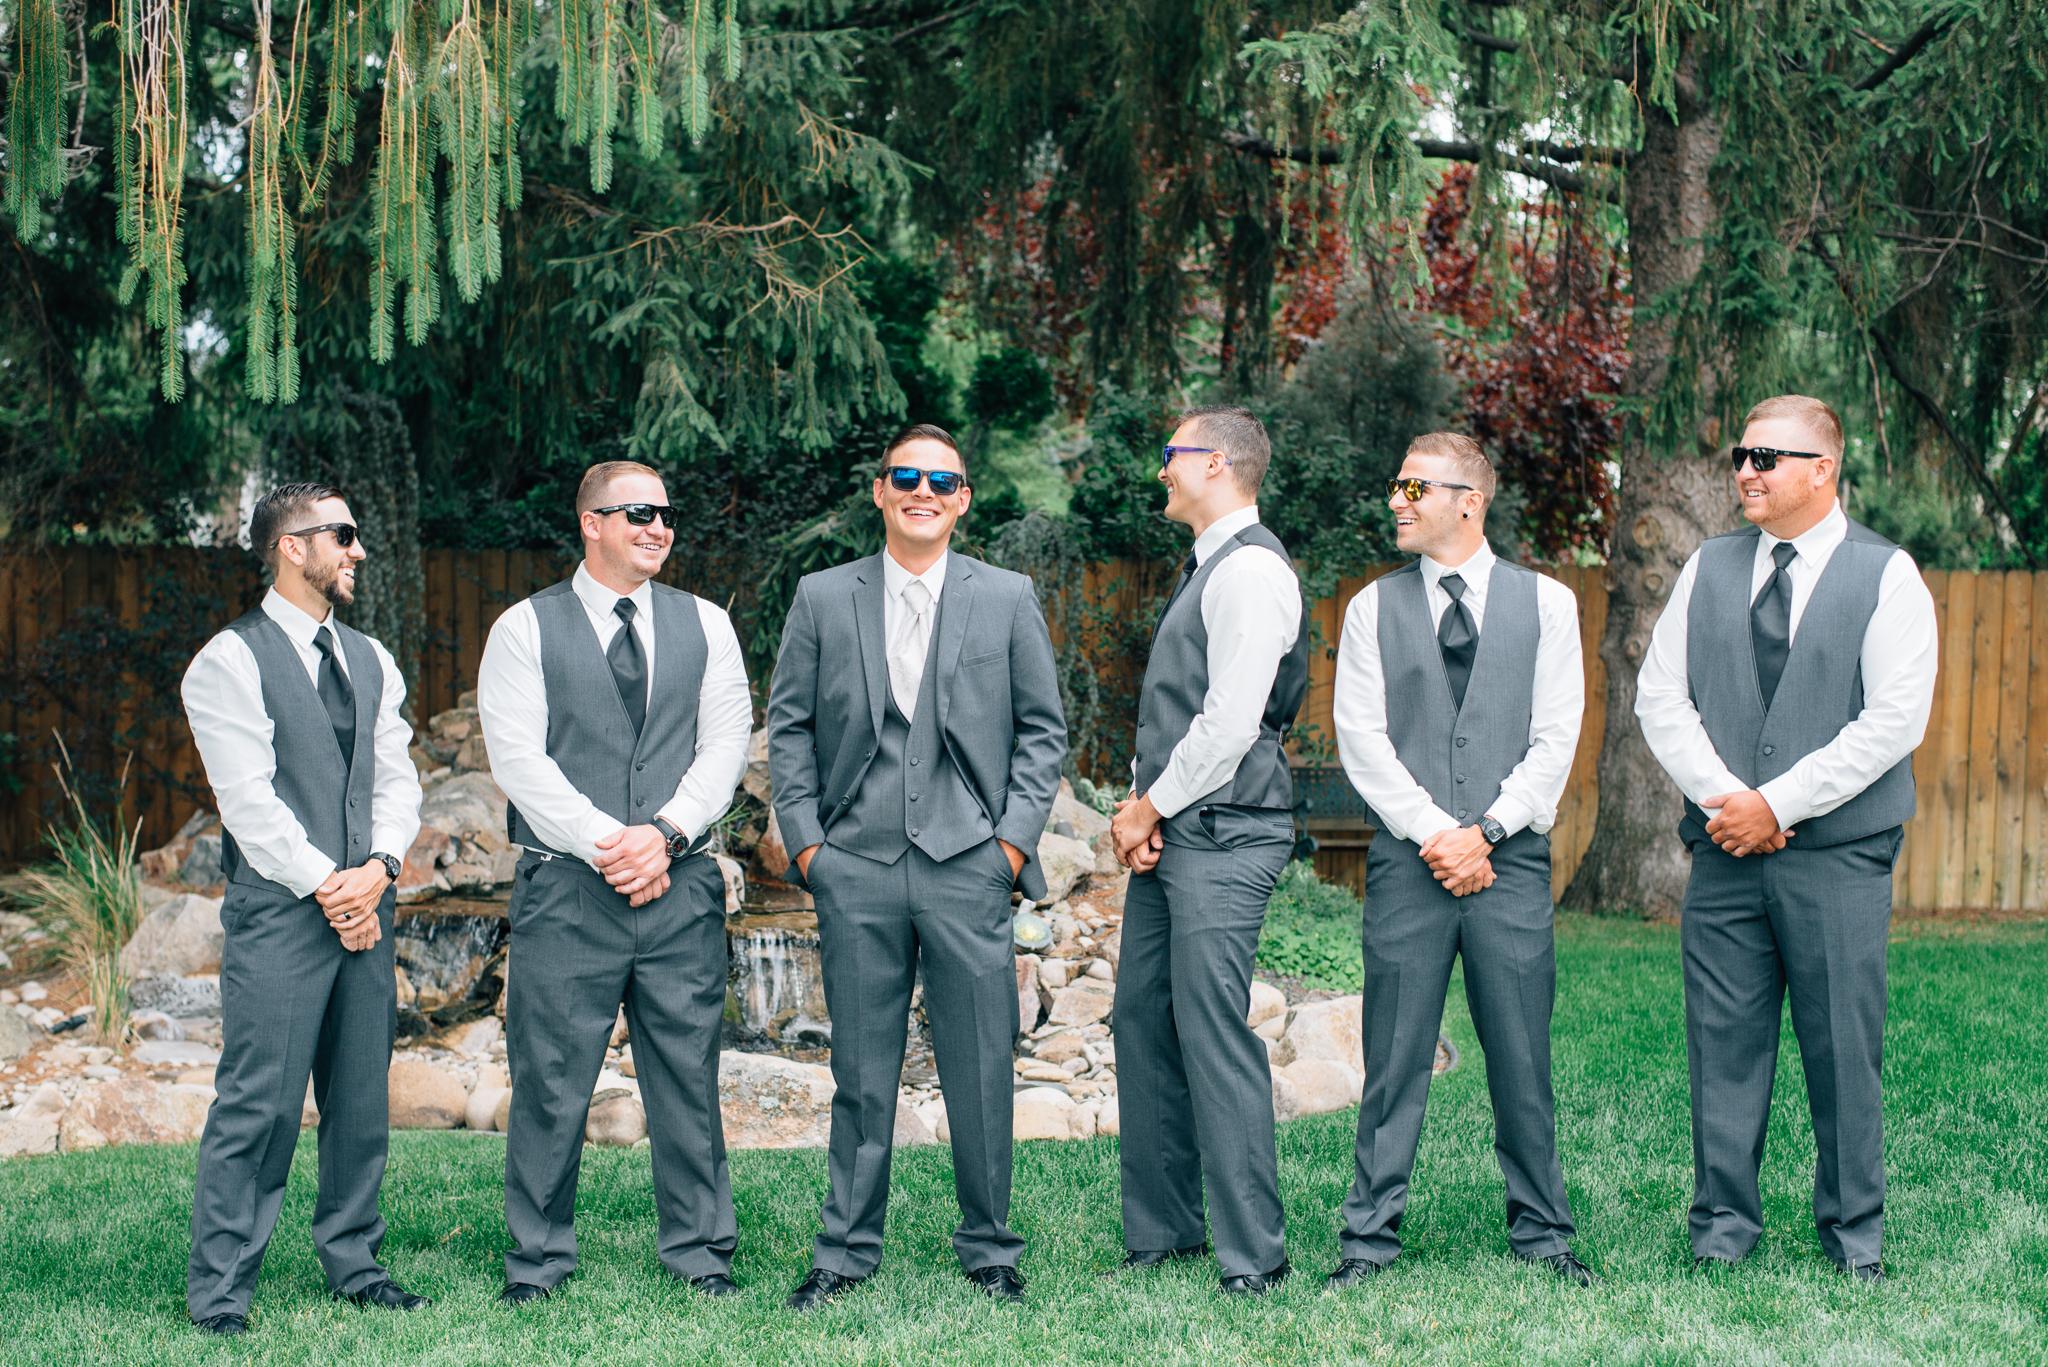 boise-wedding-photographer-4.jpg